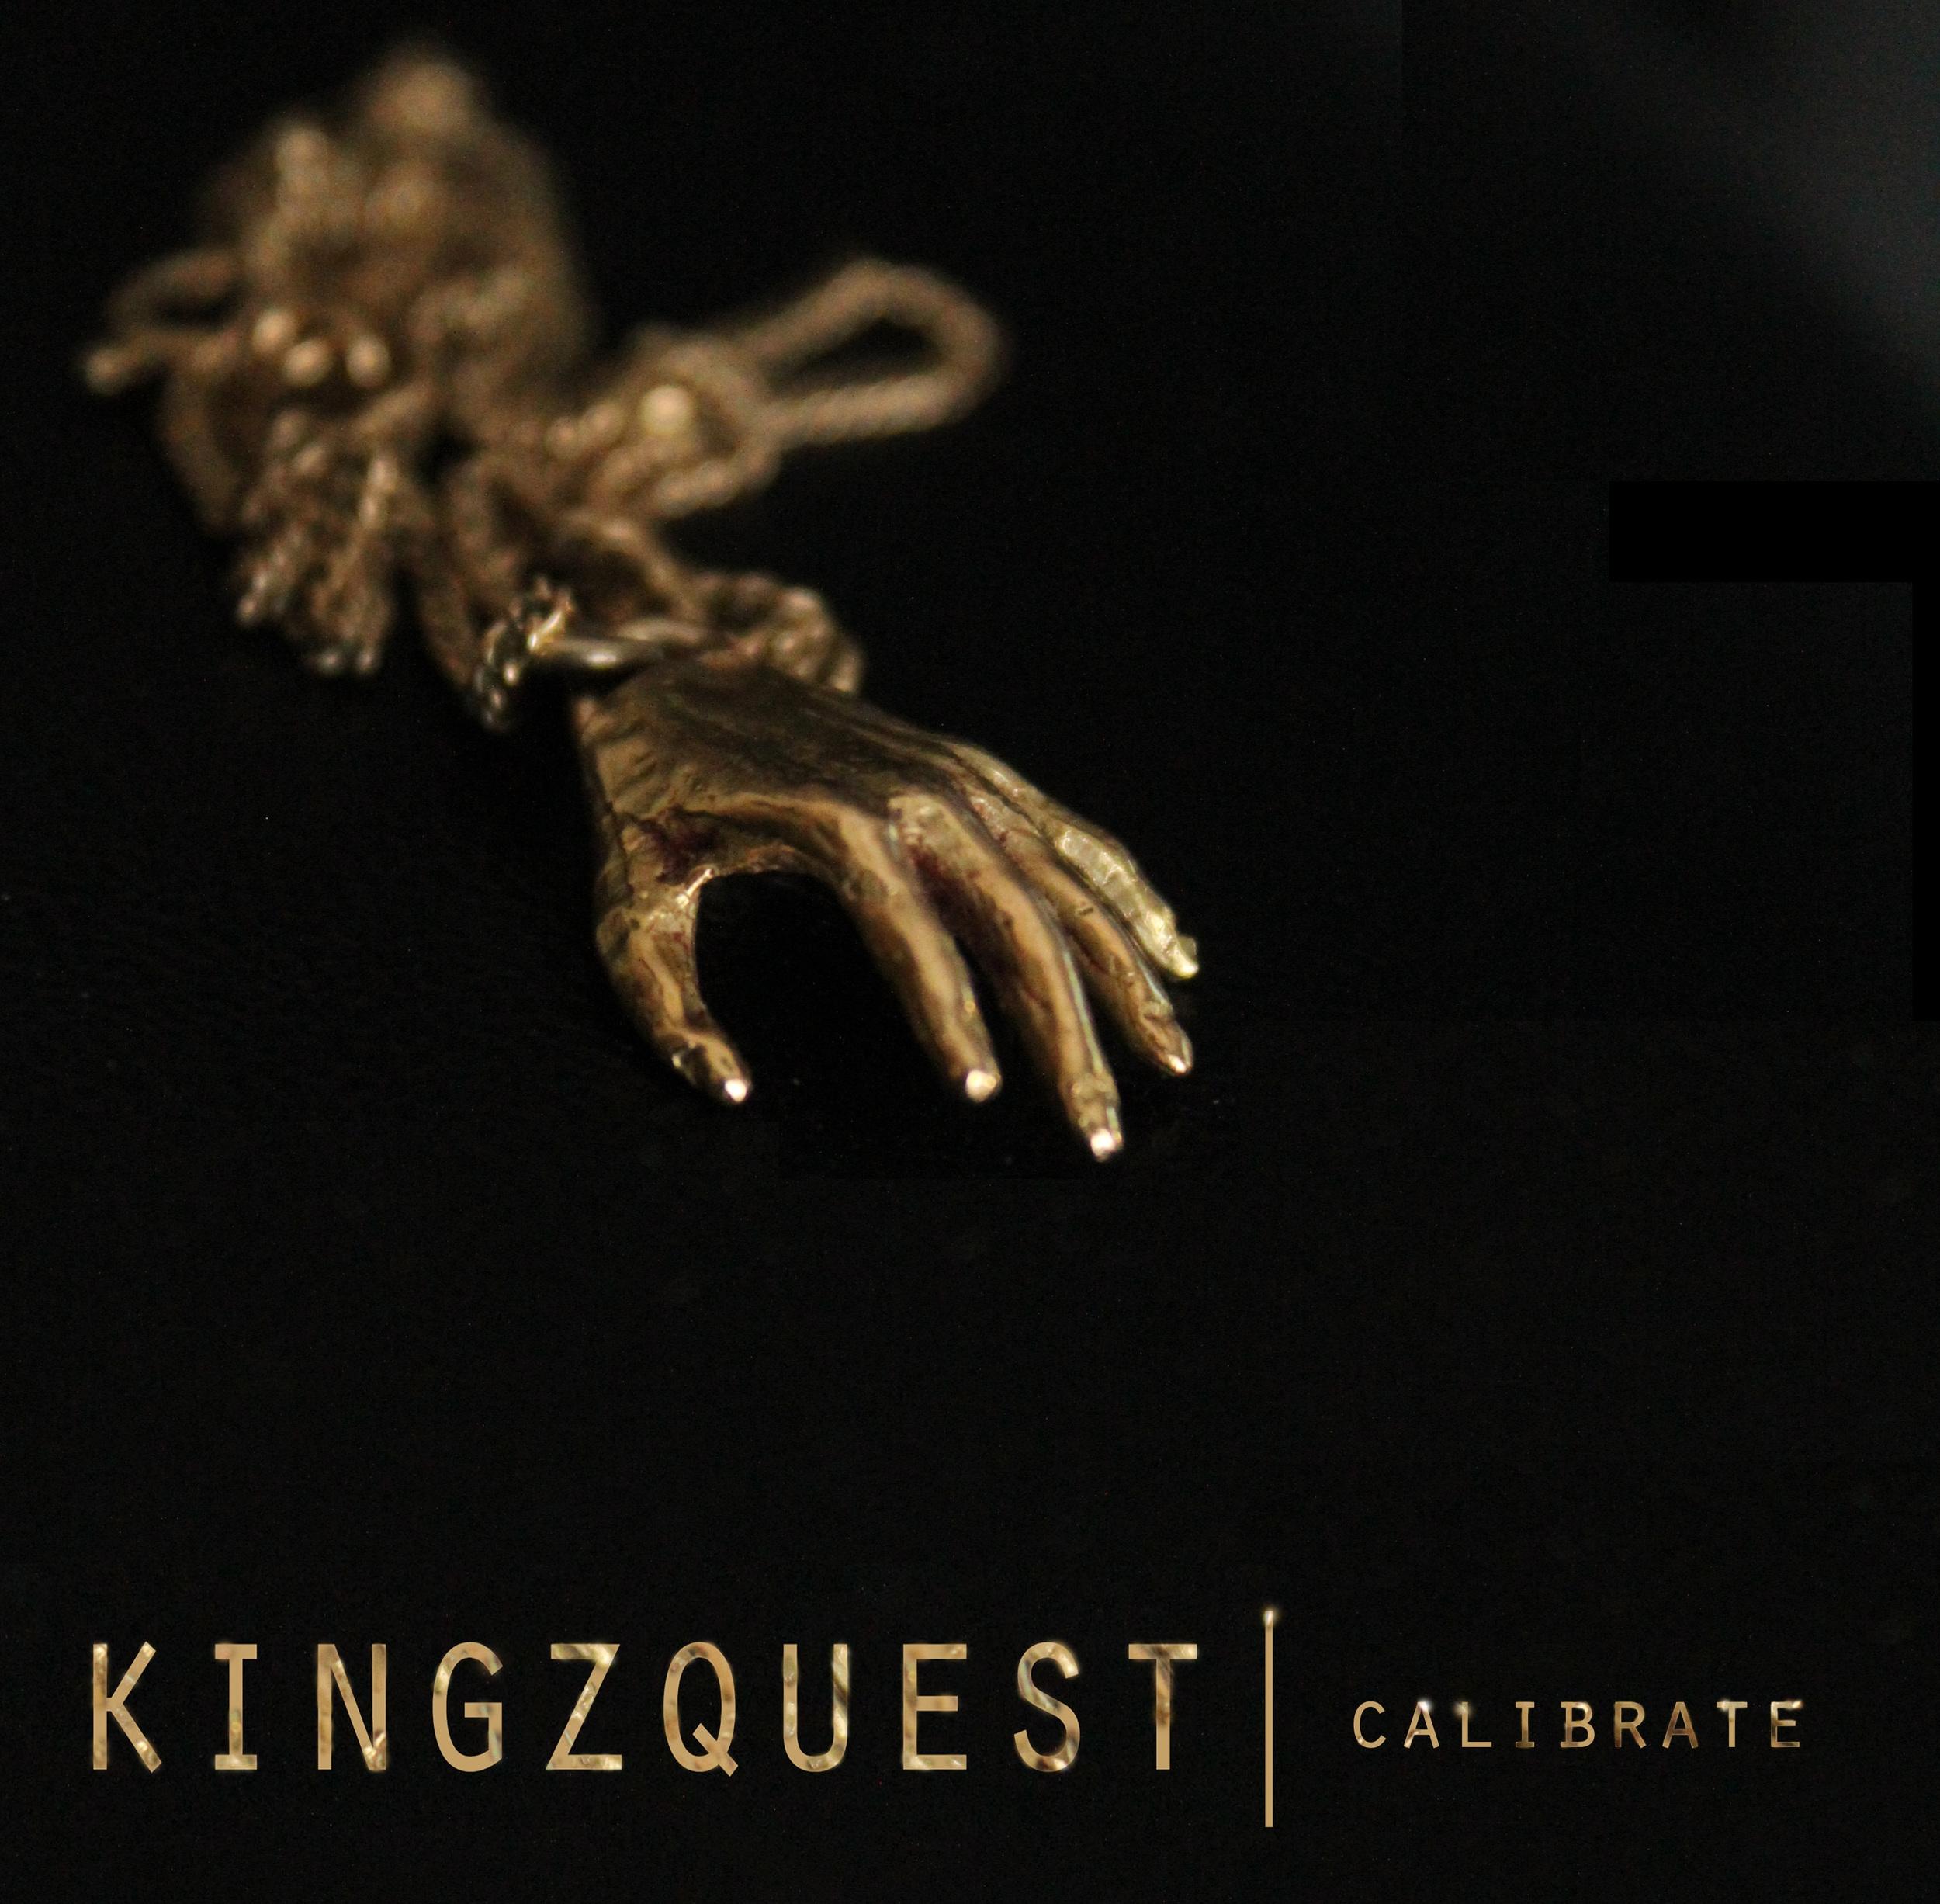 Kingzquest_Calibrate.jpg